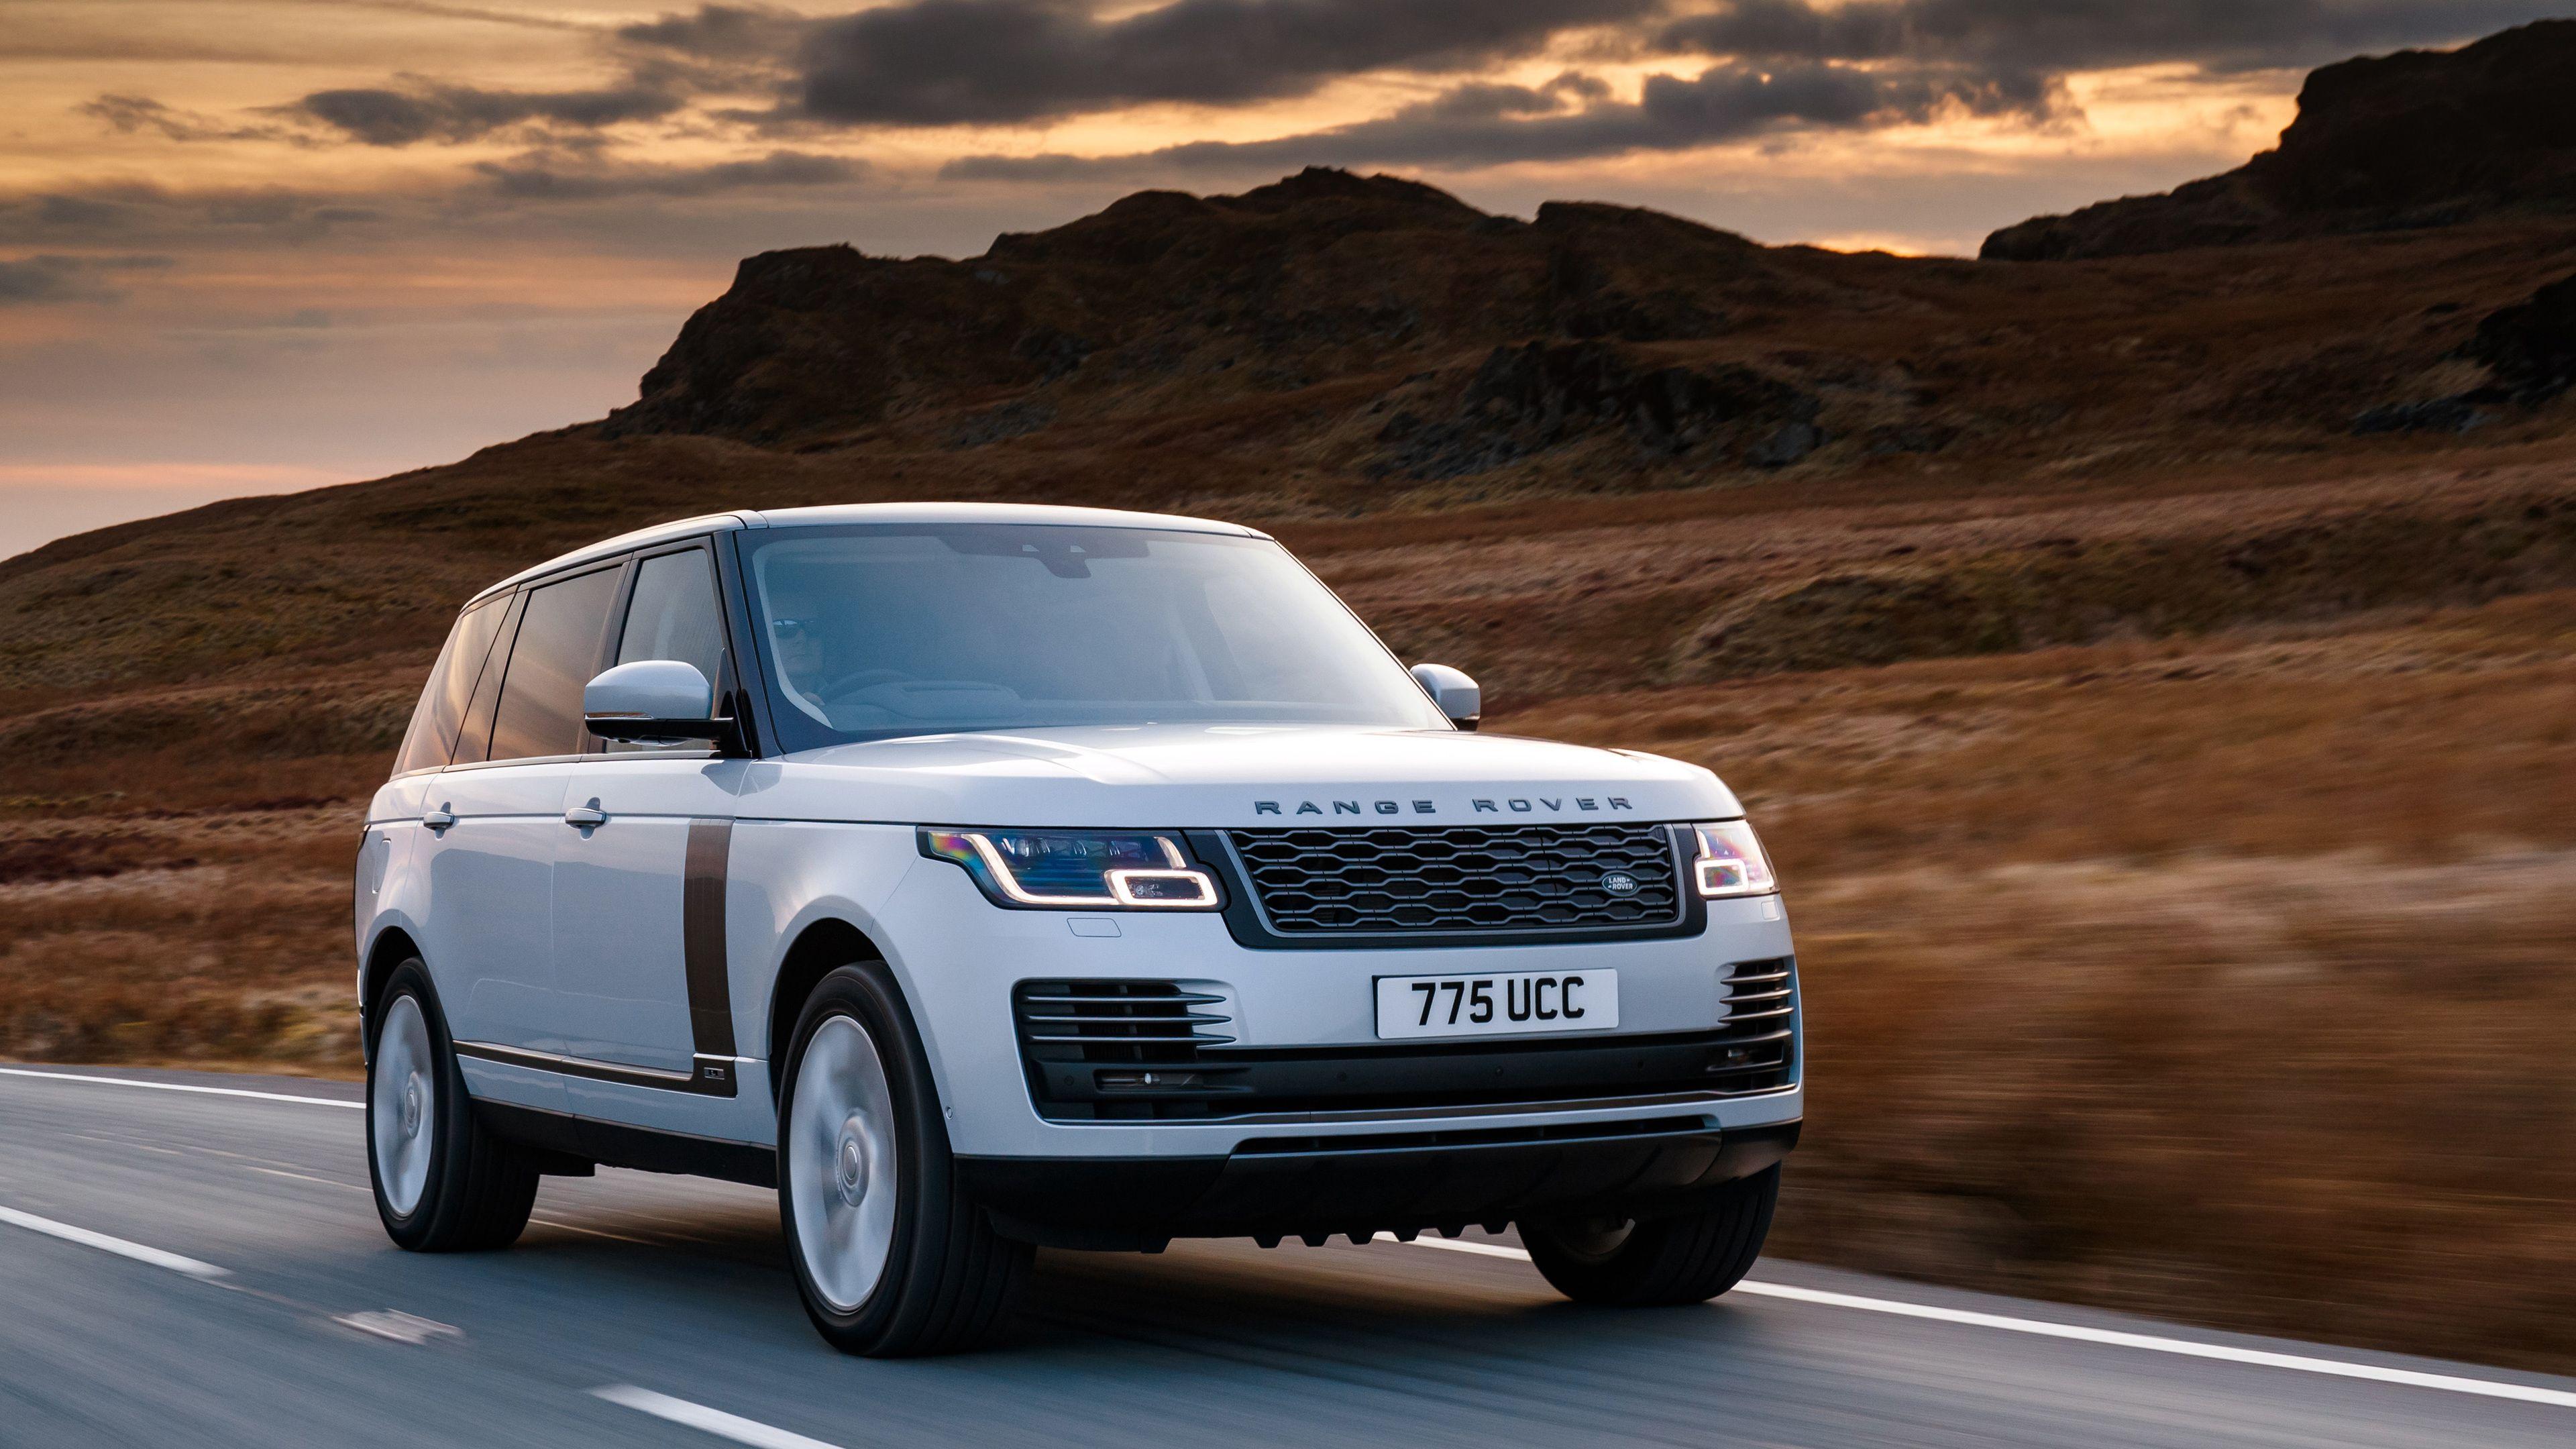 Range Rover Autobiography P400e LWB 2018 range rover wallpapers, range rover  svautobiography wallpape… | Range rover sport price, Range rover sport, Range  rover lwb